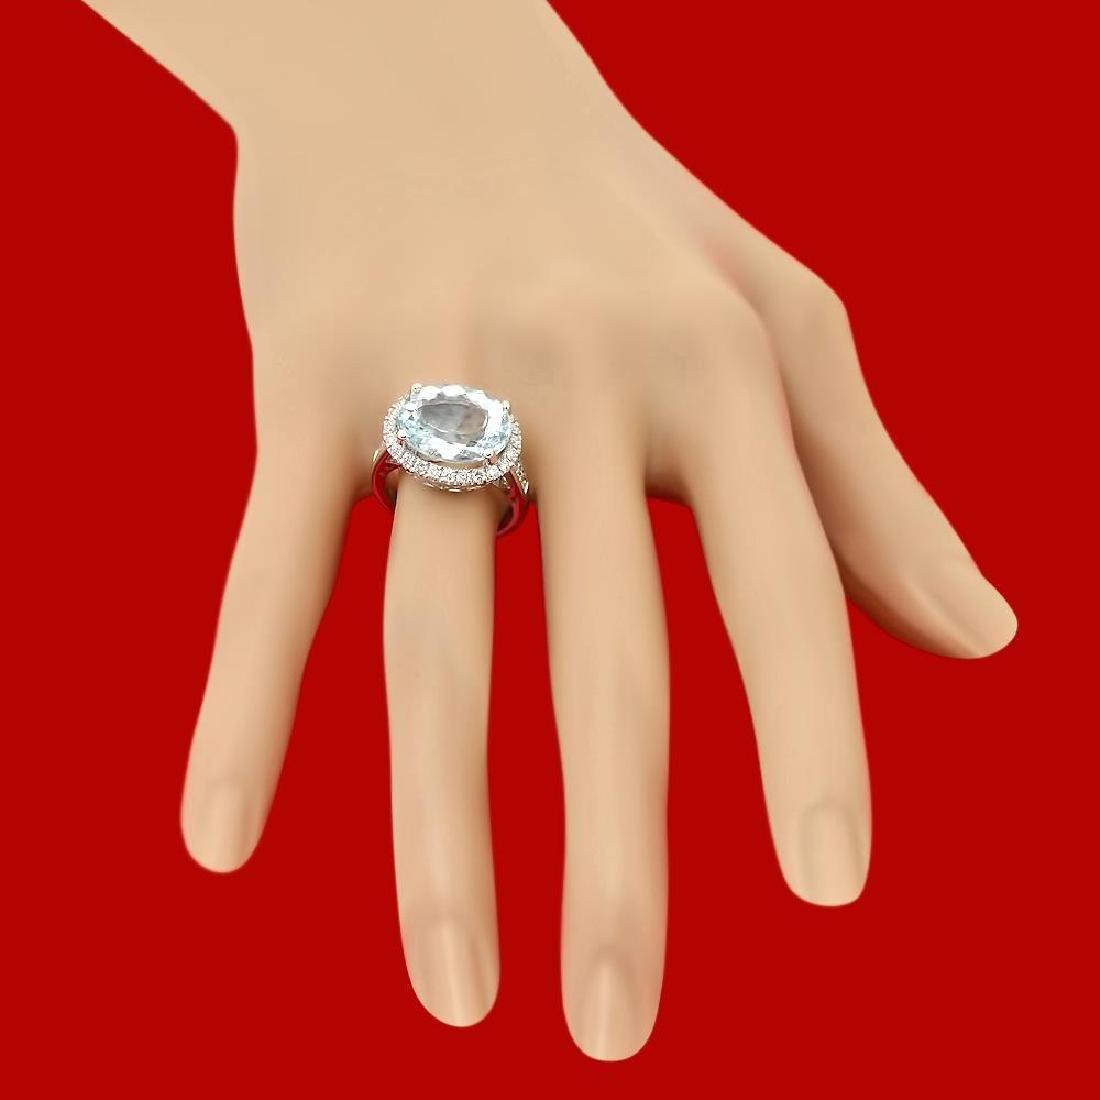 14k Gold 7.34ct Aquamarine 0.85ct Diamond Ring - 3